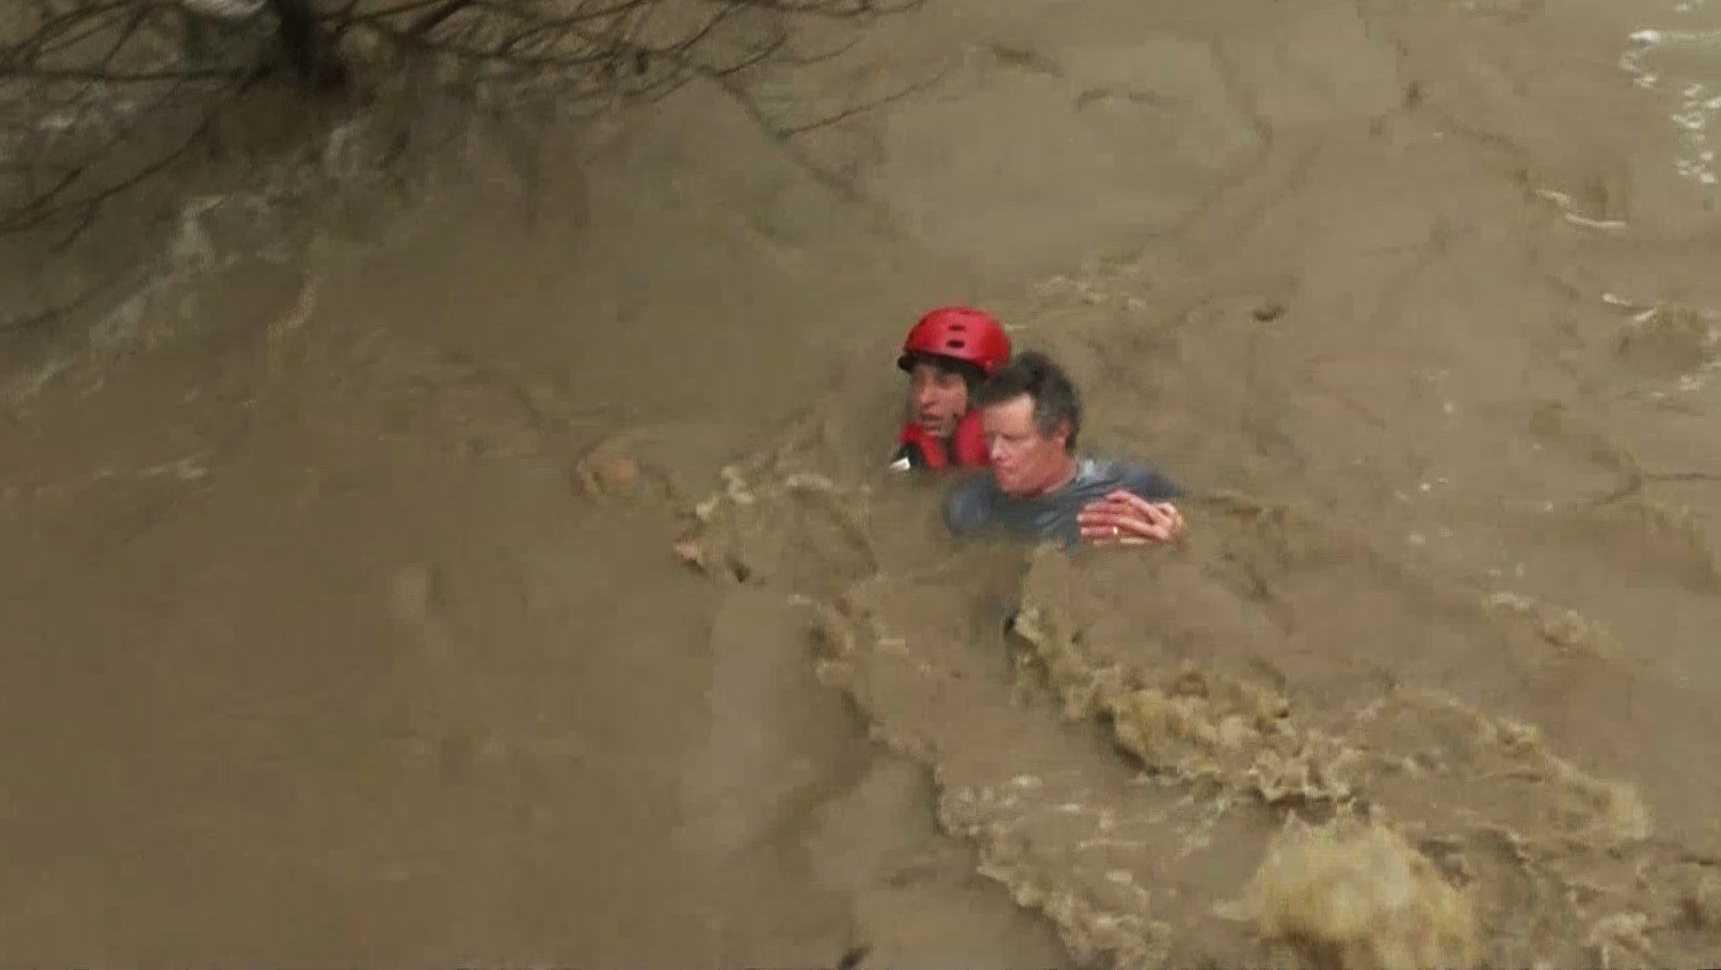 Salinas River rescue